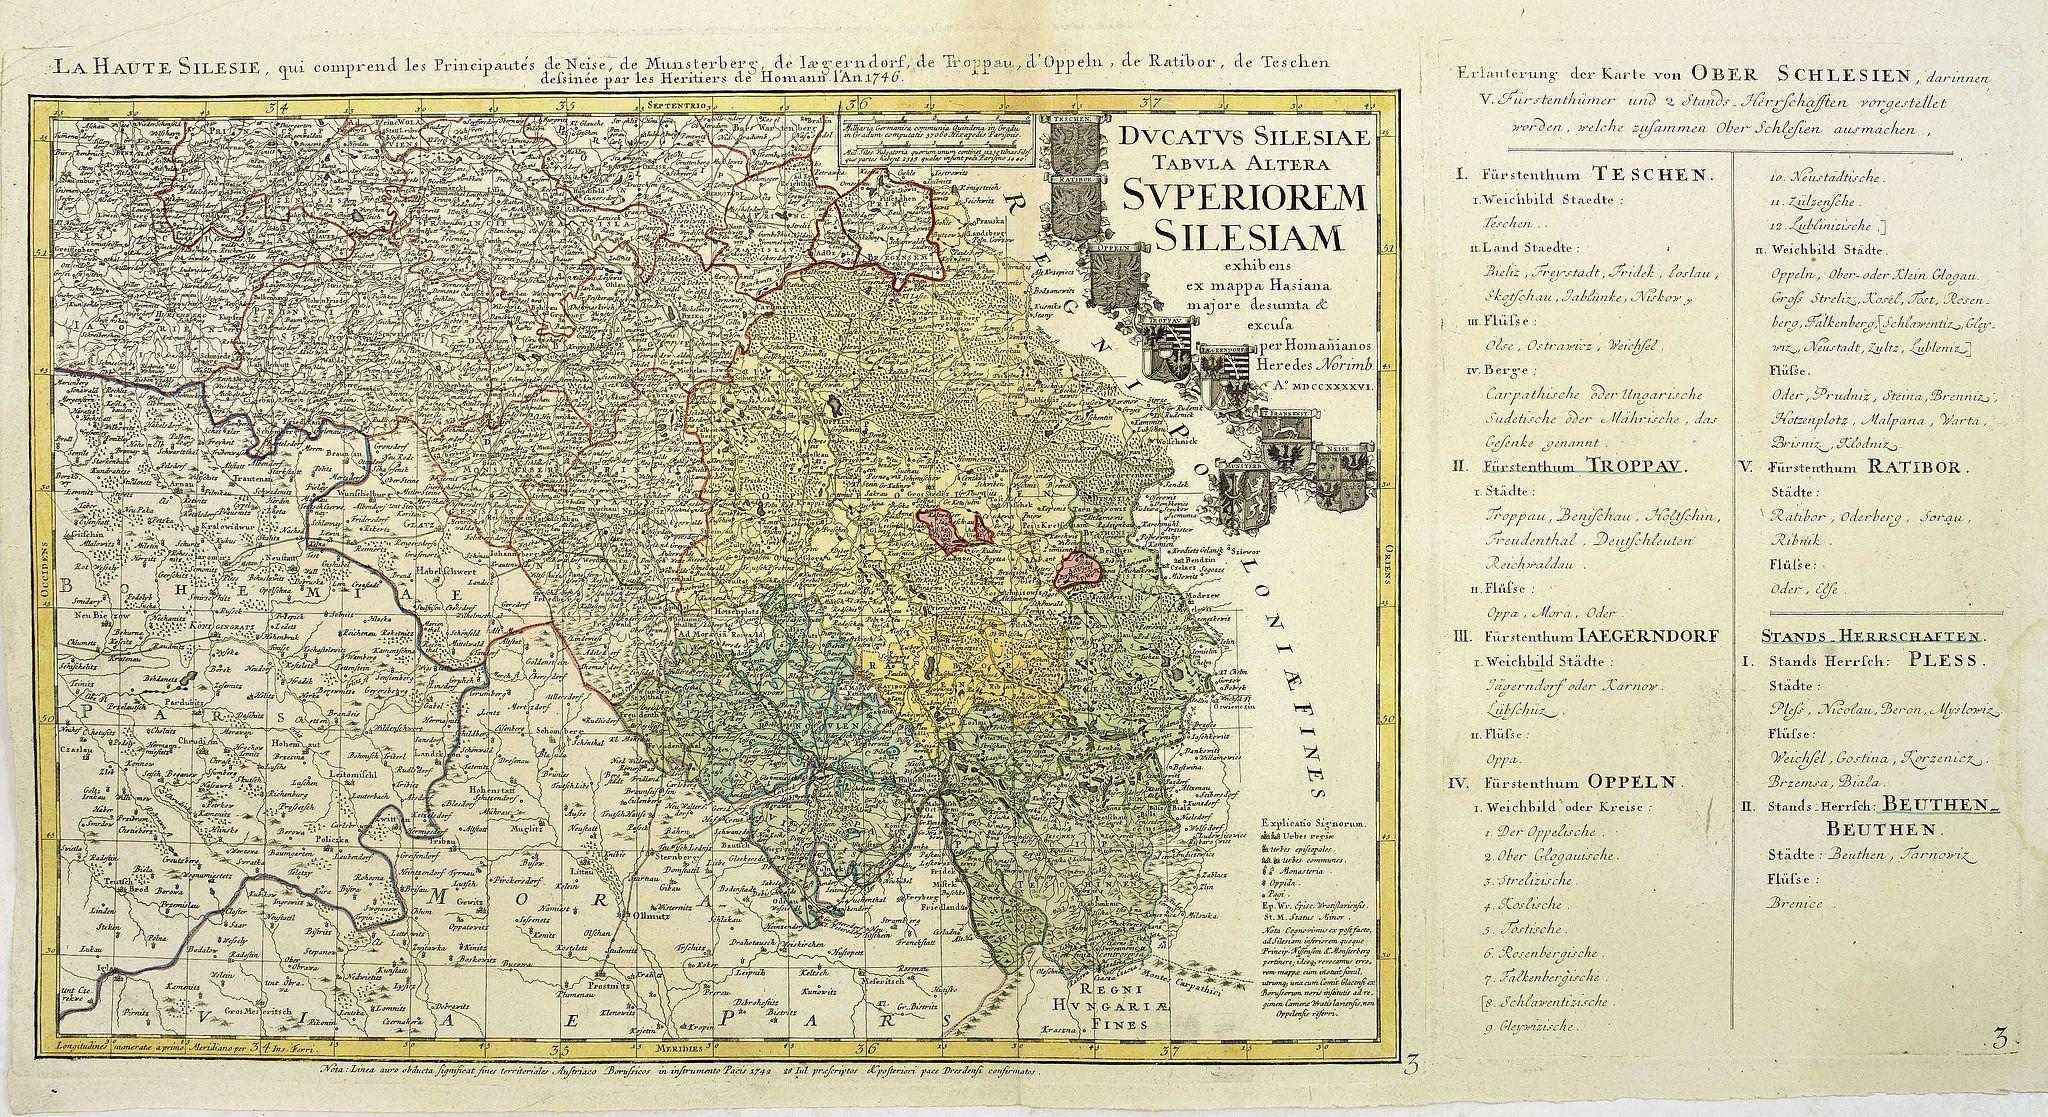 HOMANN HEIRS. -  Ducatus Silesiae Tabula Altera Superiorem Silesiam exhibens ex mappa Hasiana majore desumpta et excusa per Homannianos HeredesNorimb. Anno 1746.